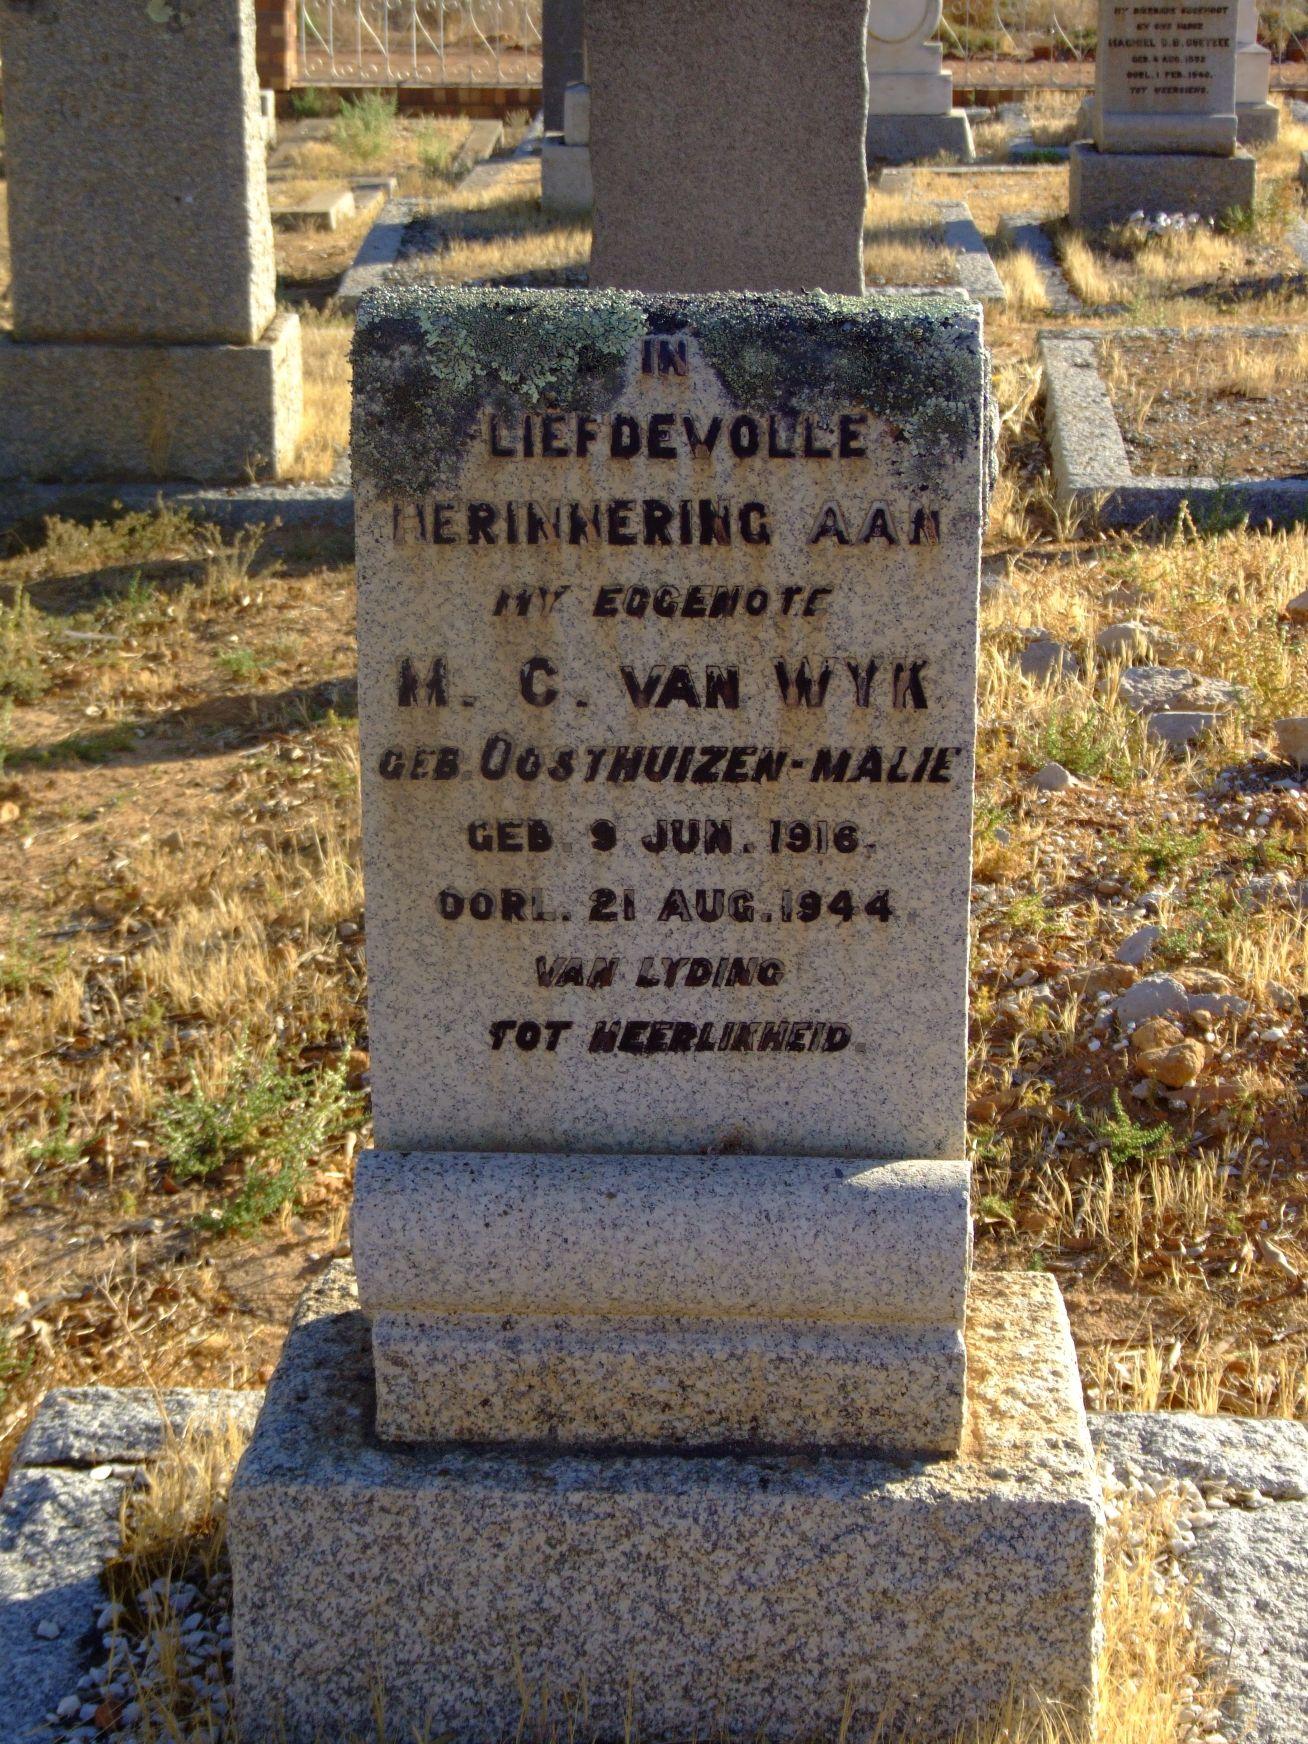 Van Wyk, H.C. geb Oosthuizen- Malie